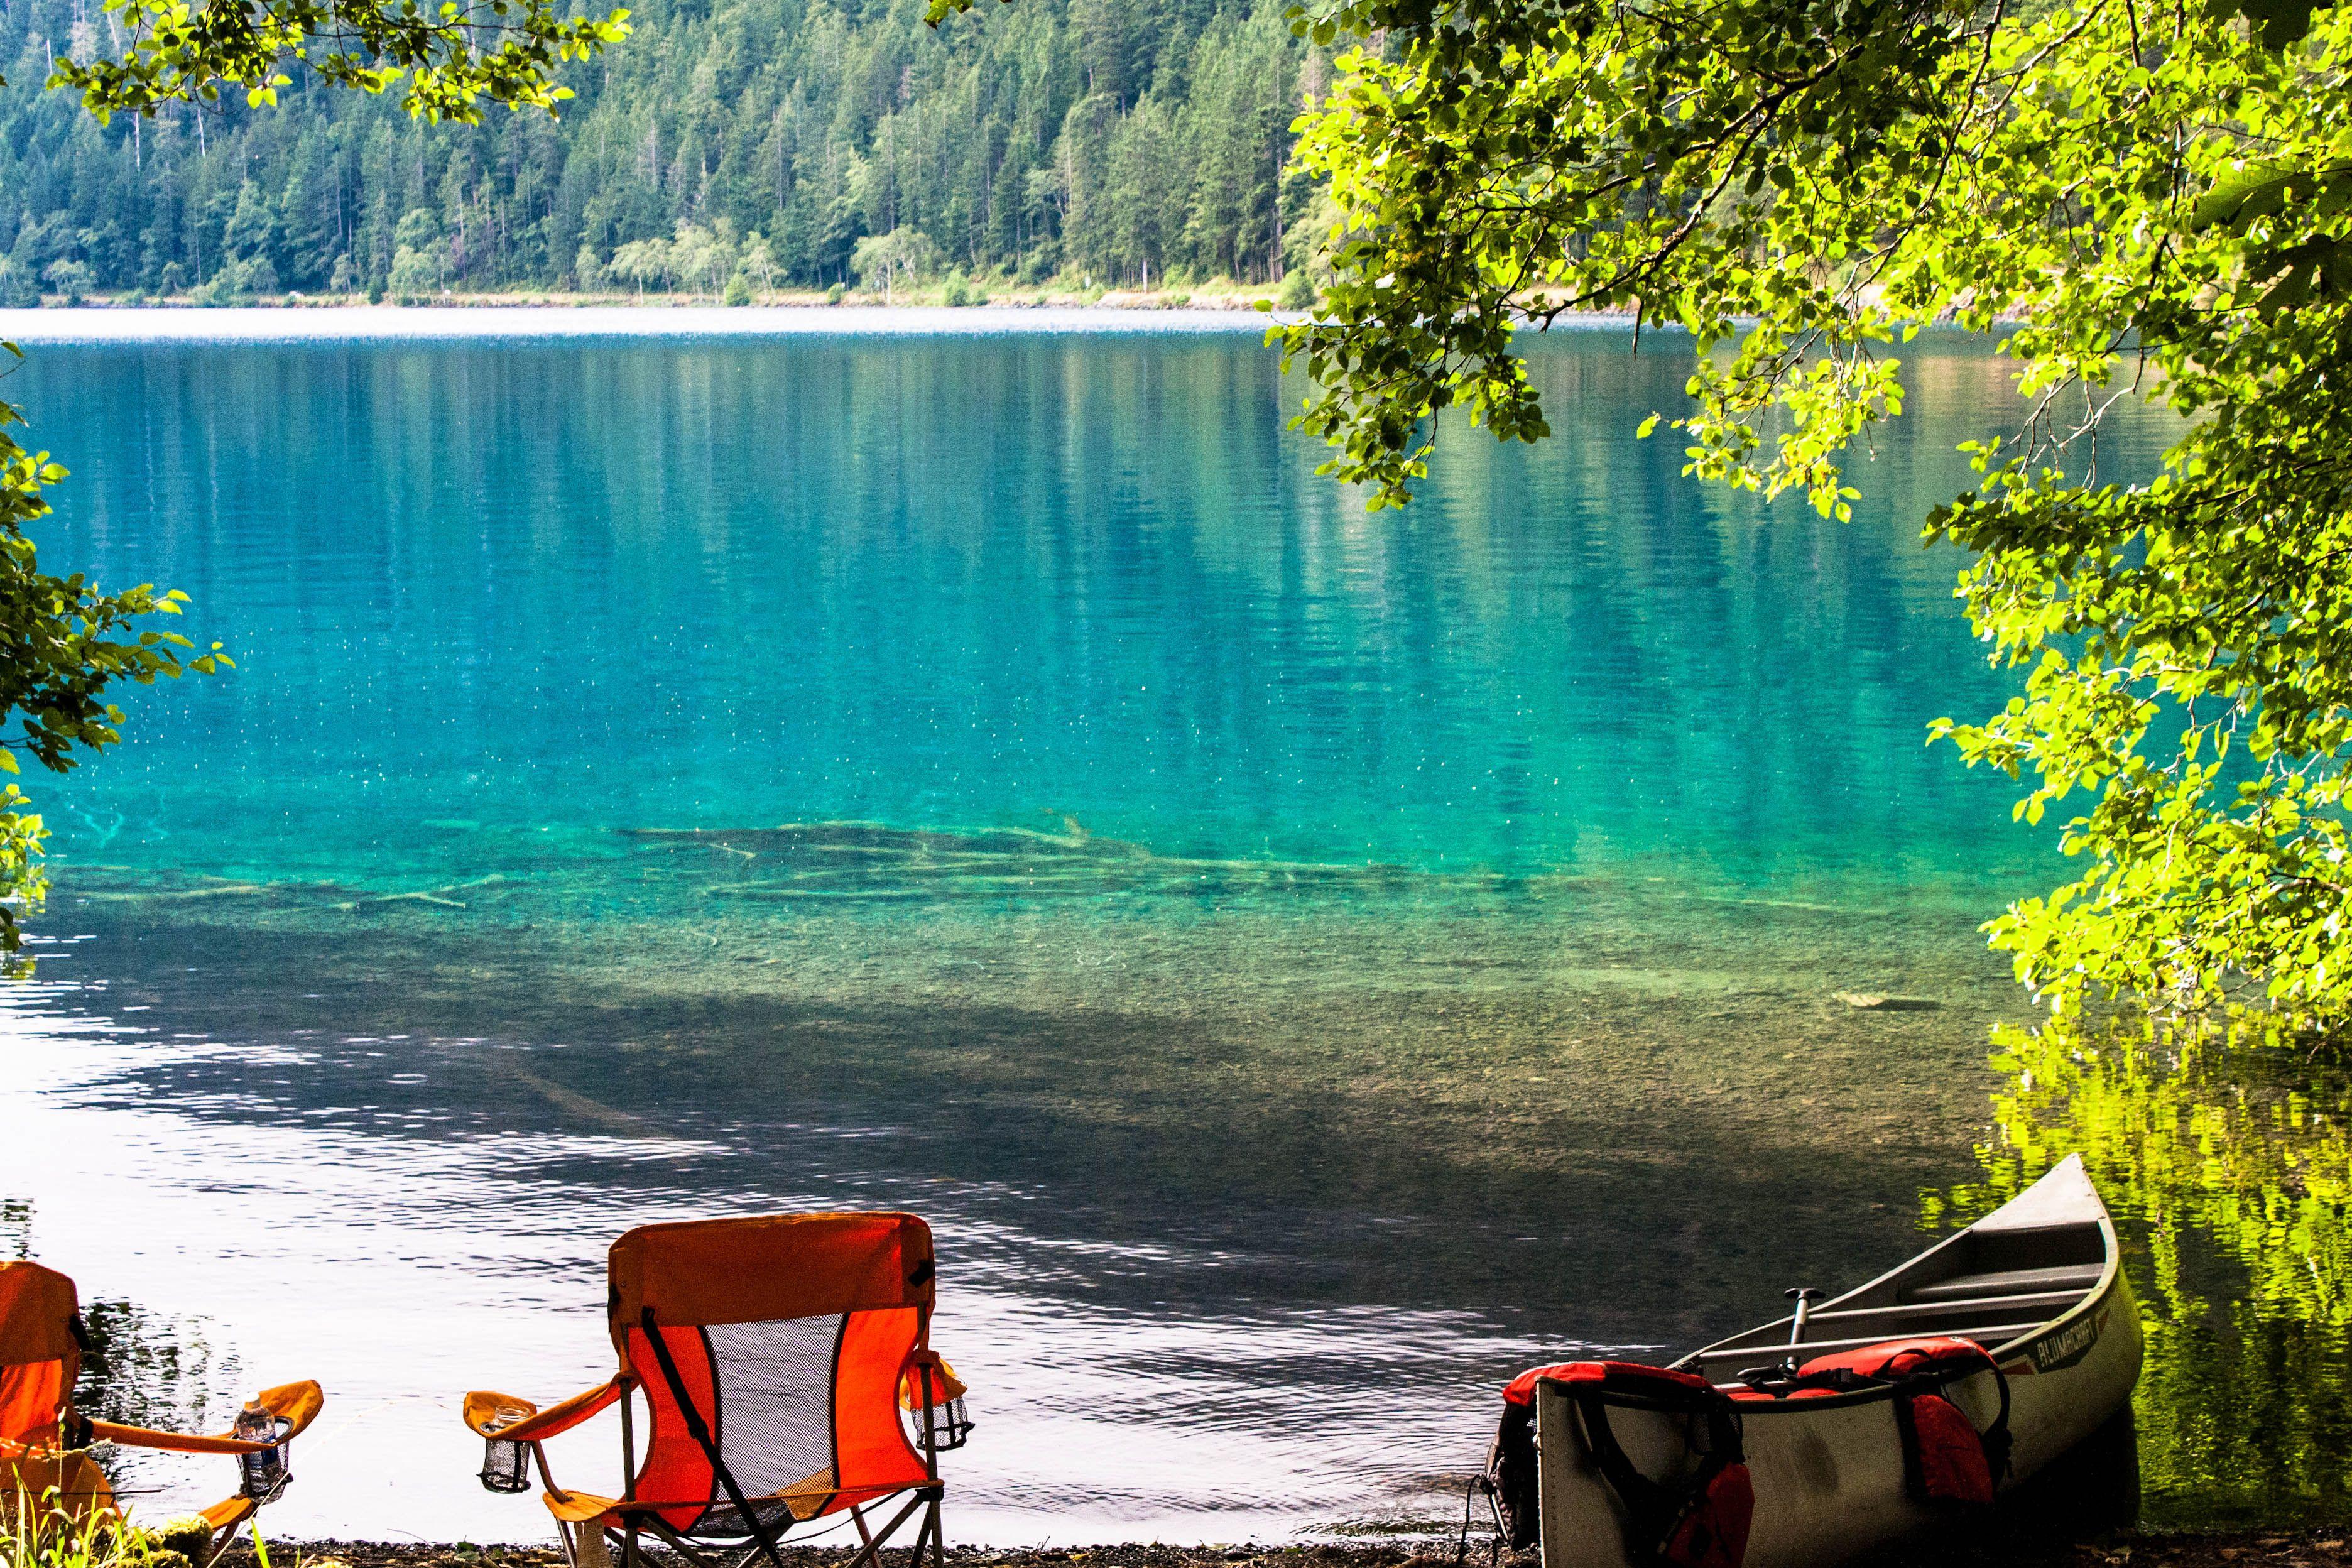 Camping at Lake Crescent in Fairholme, WA